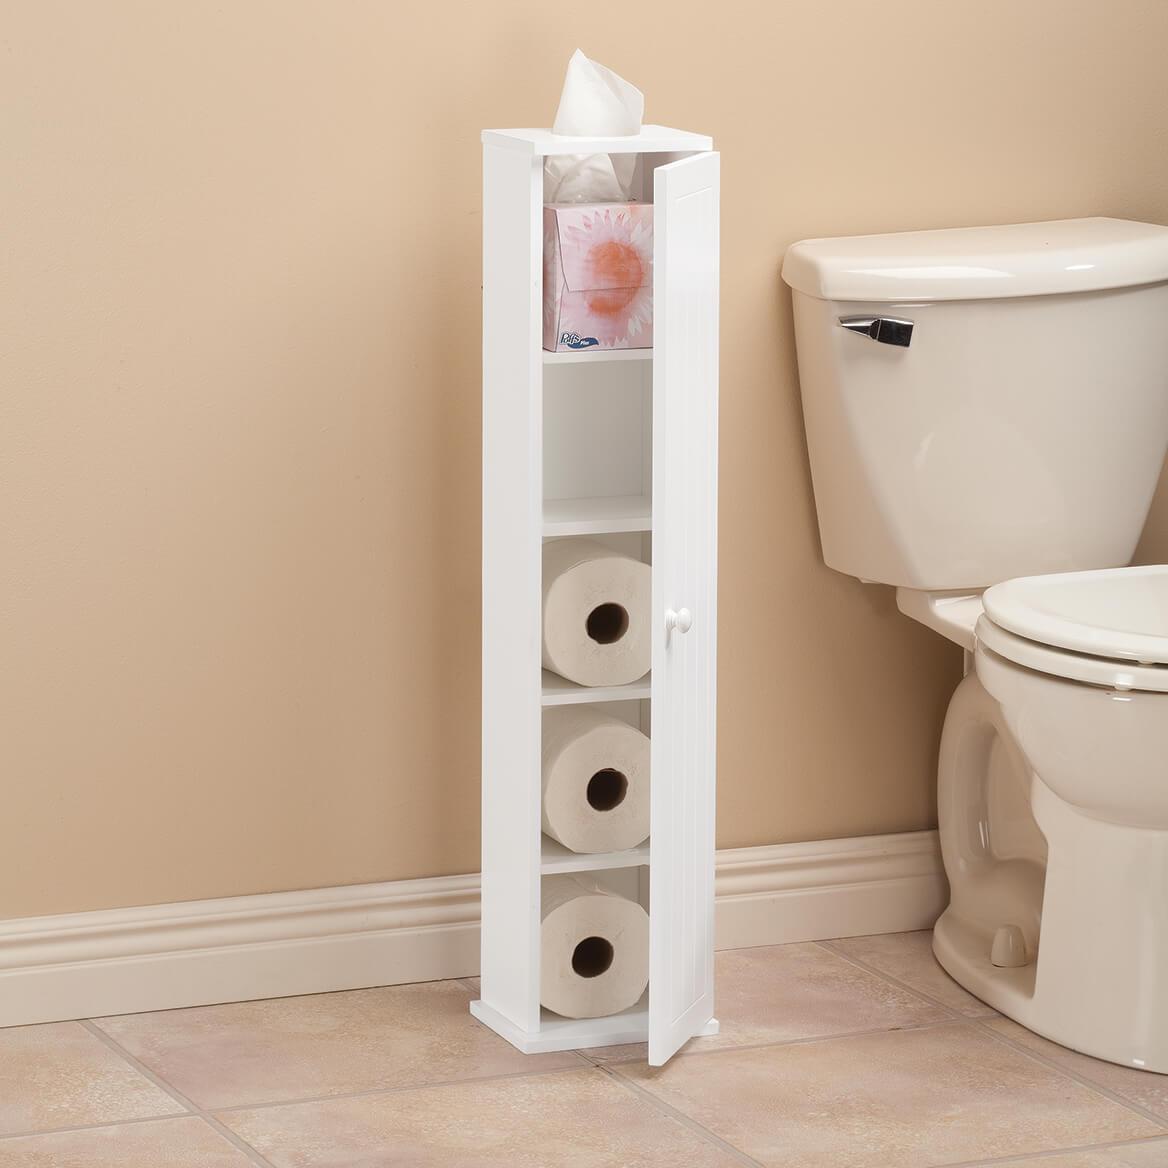 Ambrose Collection Mega Roll Toilet Tissue Tower by OakRidge-366666